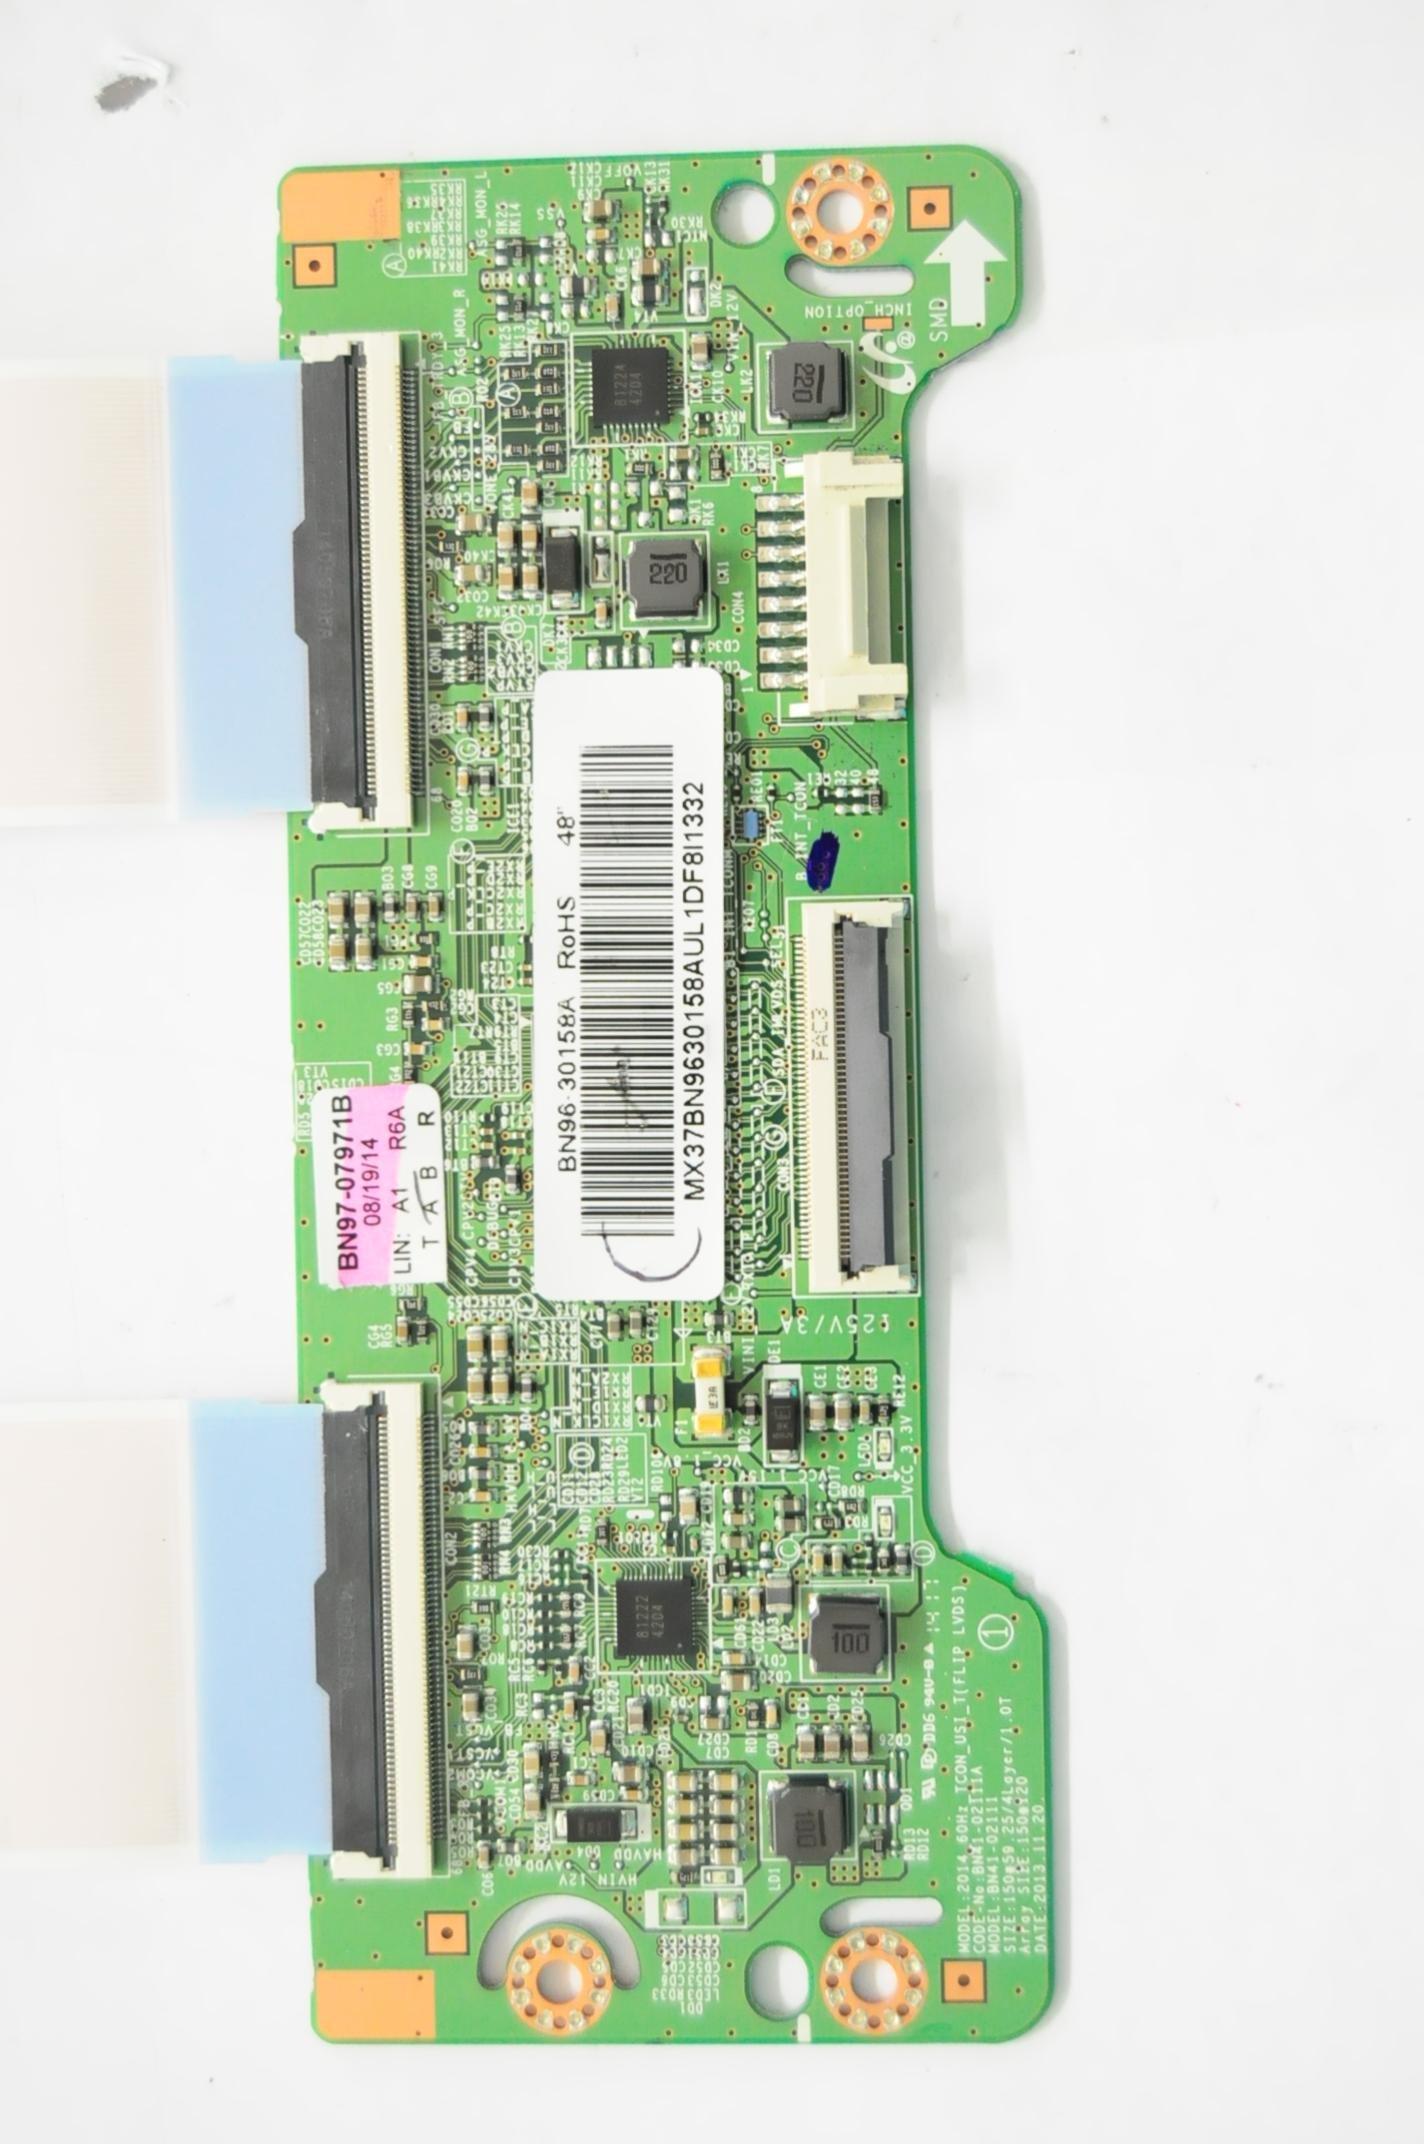 UN65HU9000FXZA UN65HU9000FXZX UN65HU9000F UN55D6000SFXZA OEM Samsung Power Cord Cable Shipped with Samsung UN55D6000SF UN55D6000SFBZA